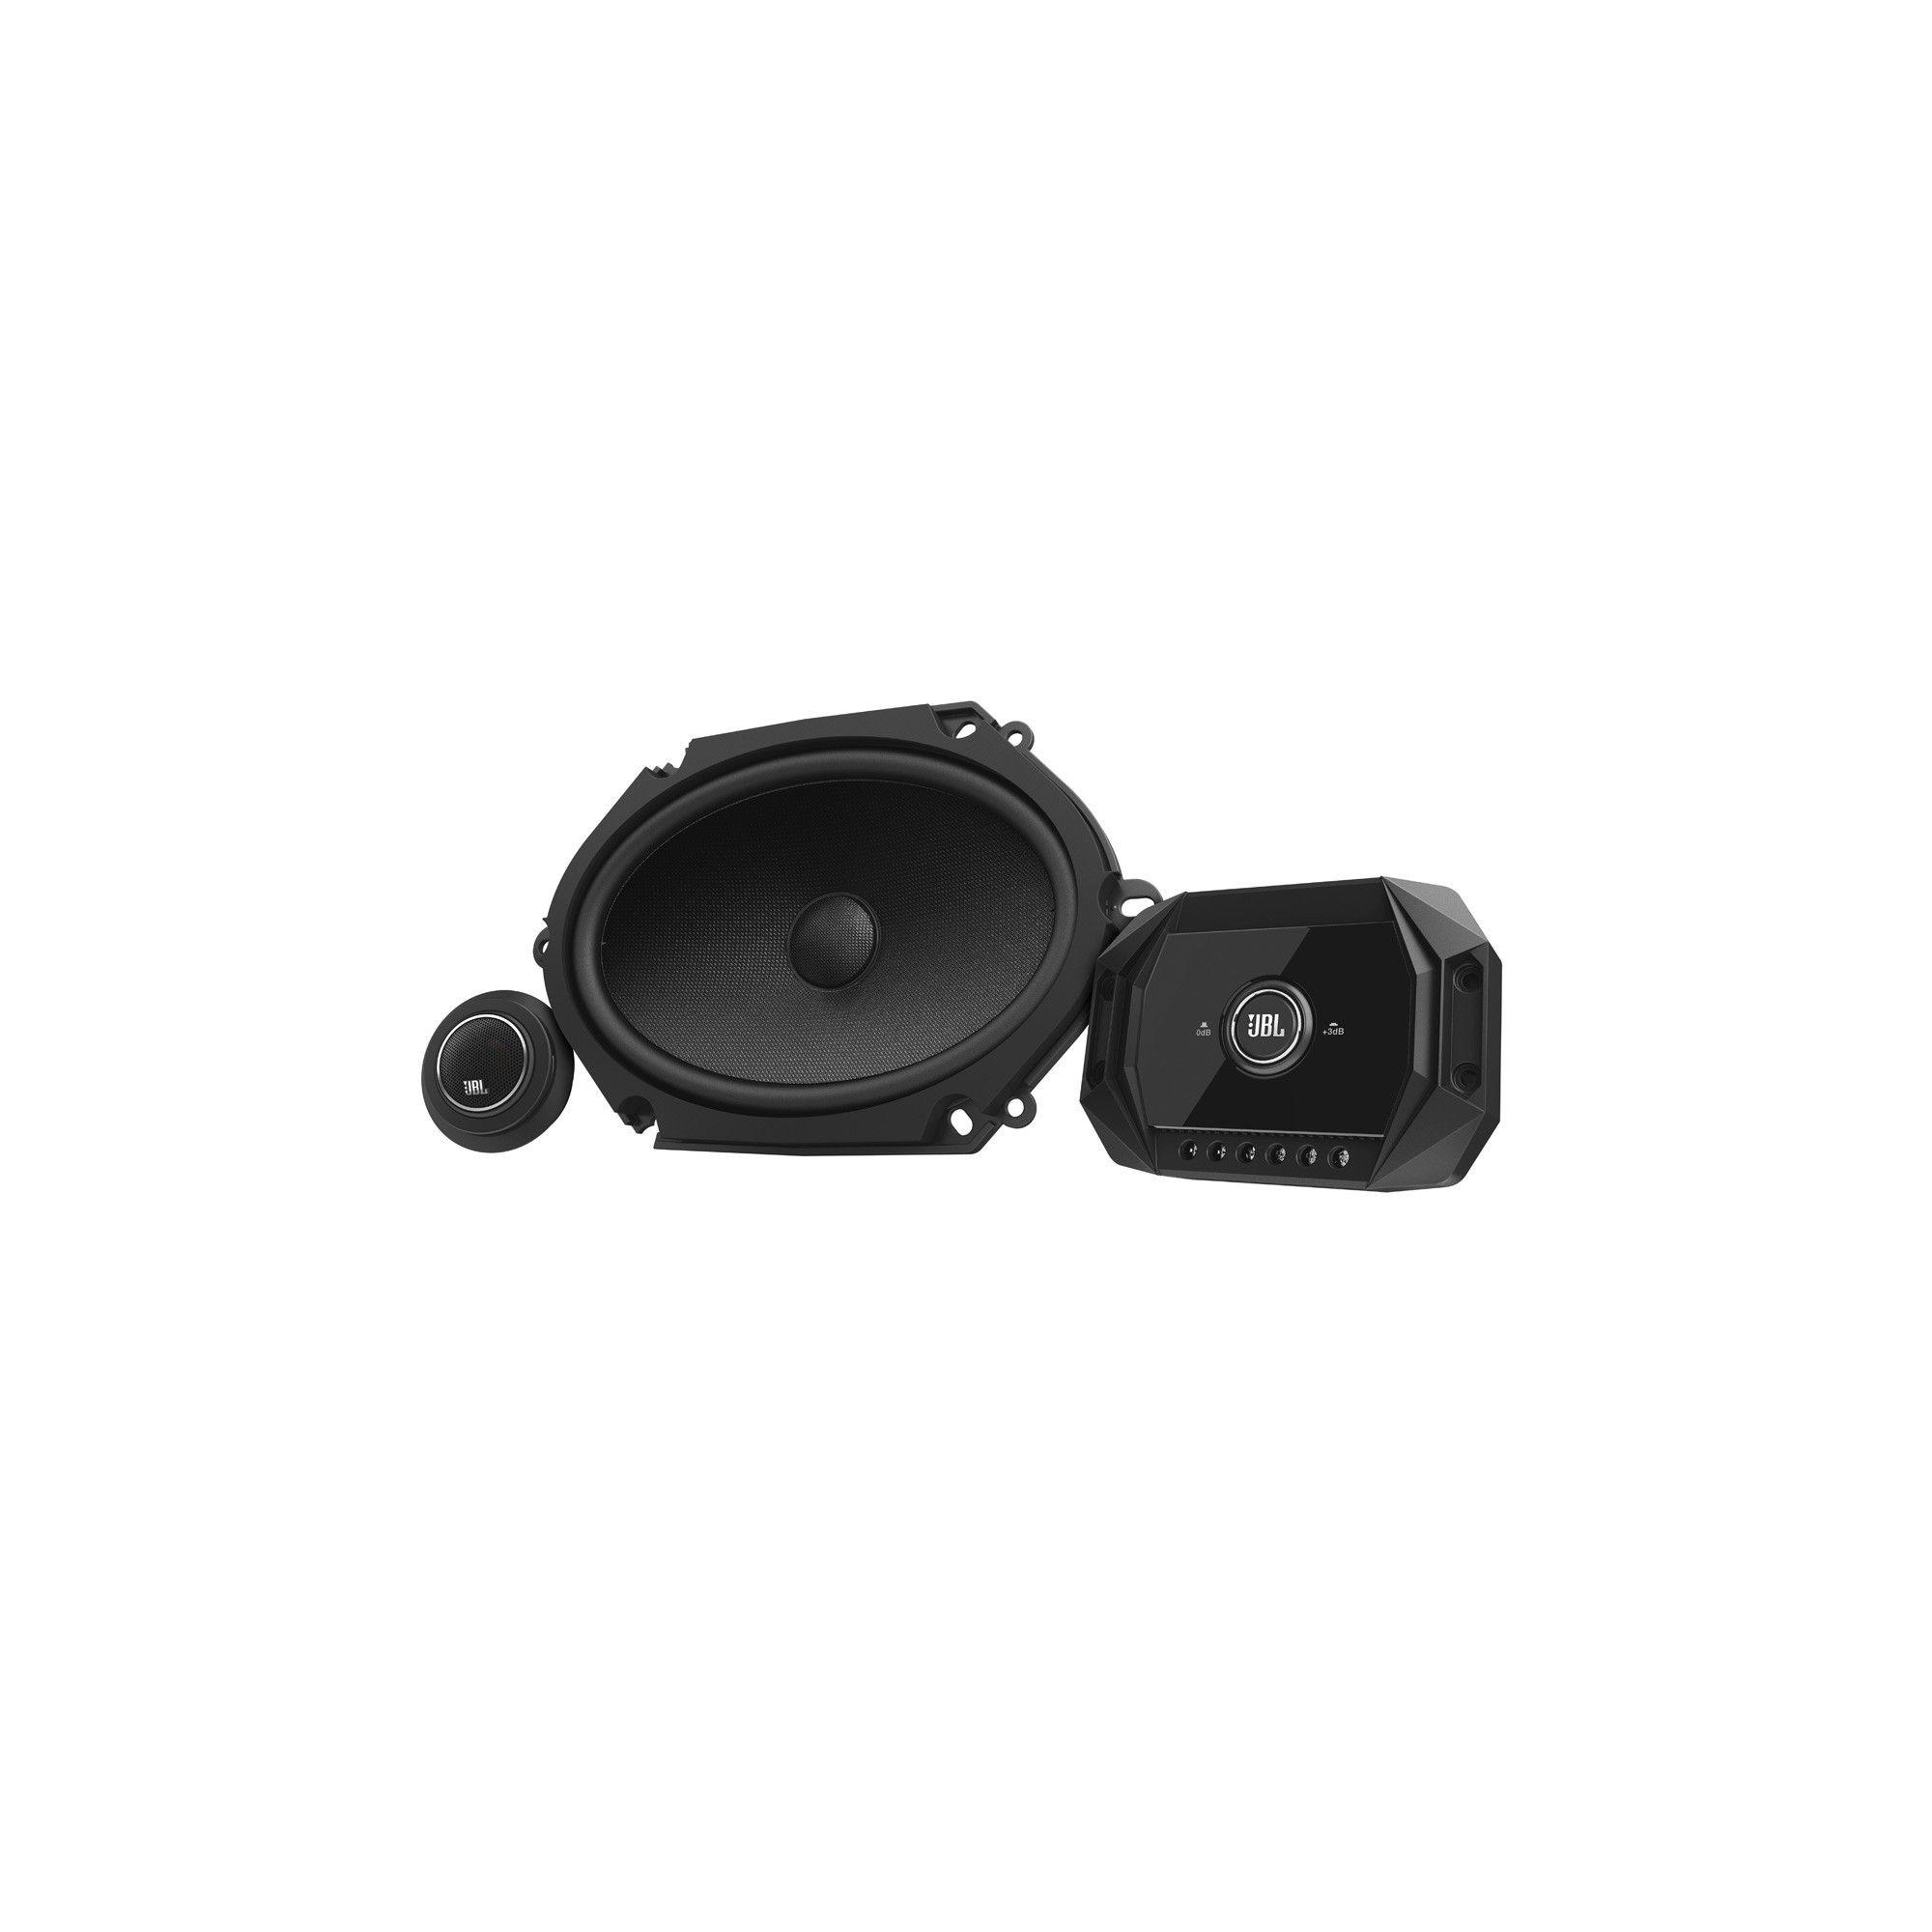 JBL Stadium GTO 860C 6x8 2-Way Stadium Component Speakers, Black #componentspeakers